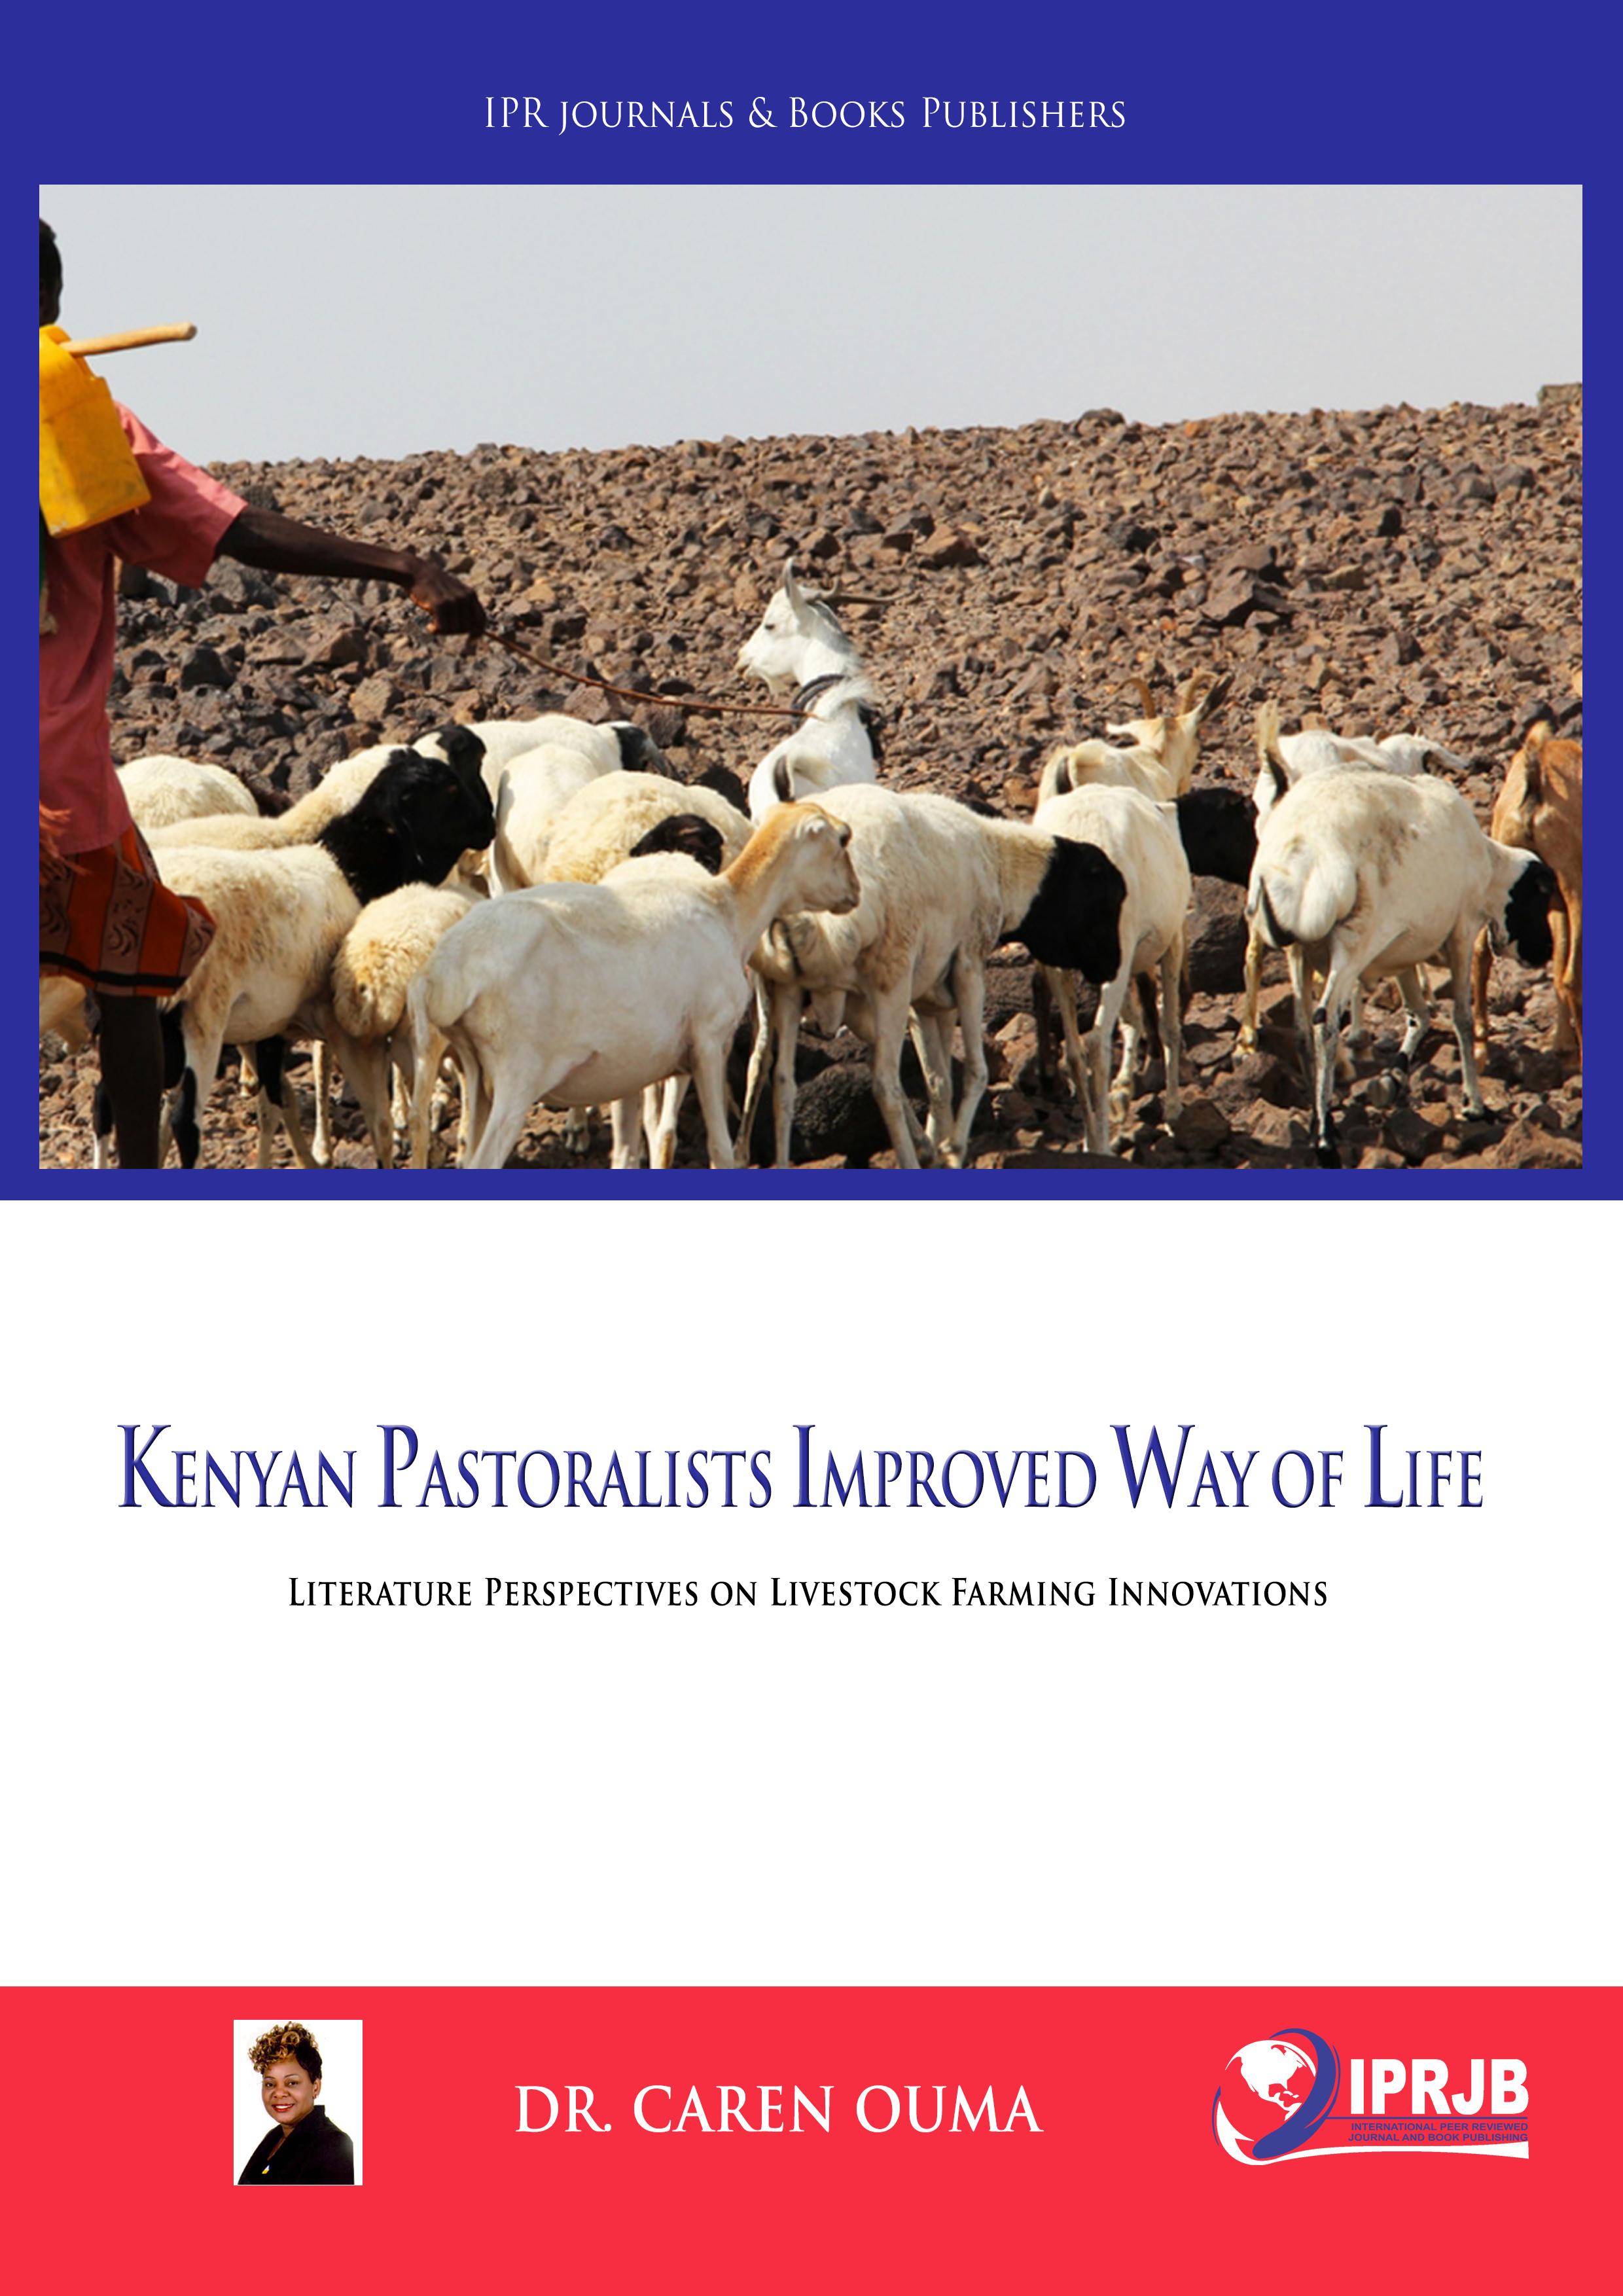 Kenyan Pastoralists improved way of life; literature perspectives on livestock farming innovations